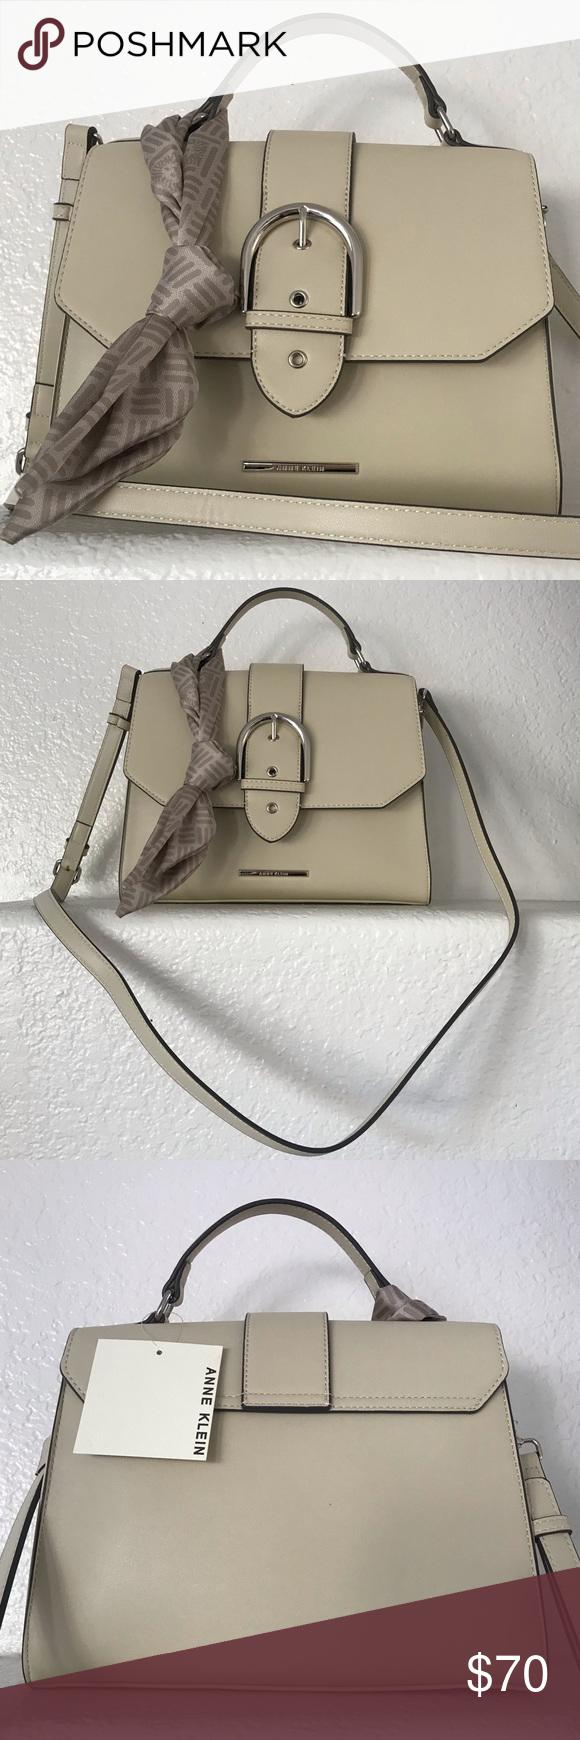 f5a96ee2239 Anne Klein Women's handbag. Beautiful, elegant Anne Klein ladylike top  handle handbag. Anne Klein Bags